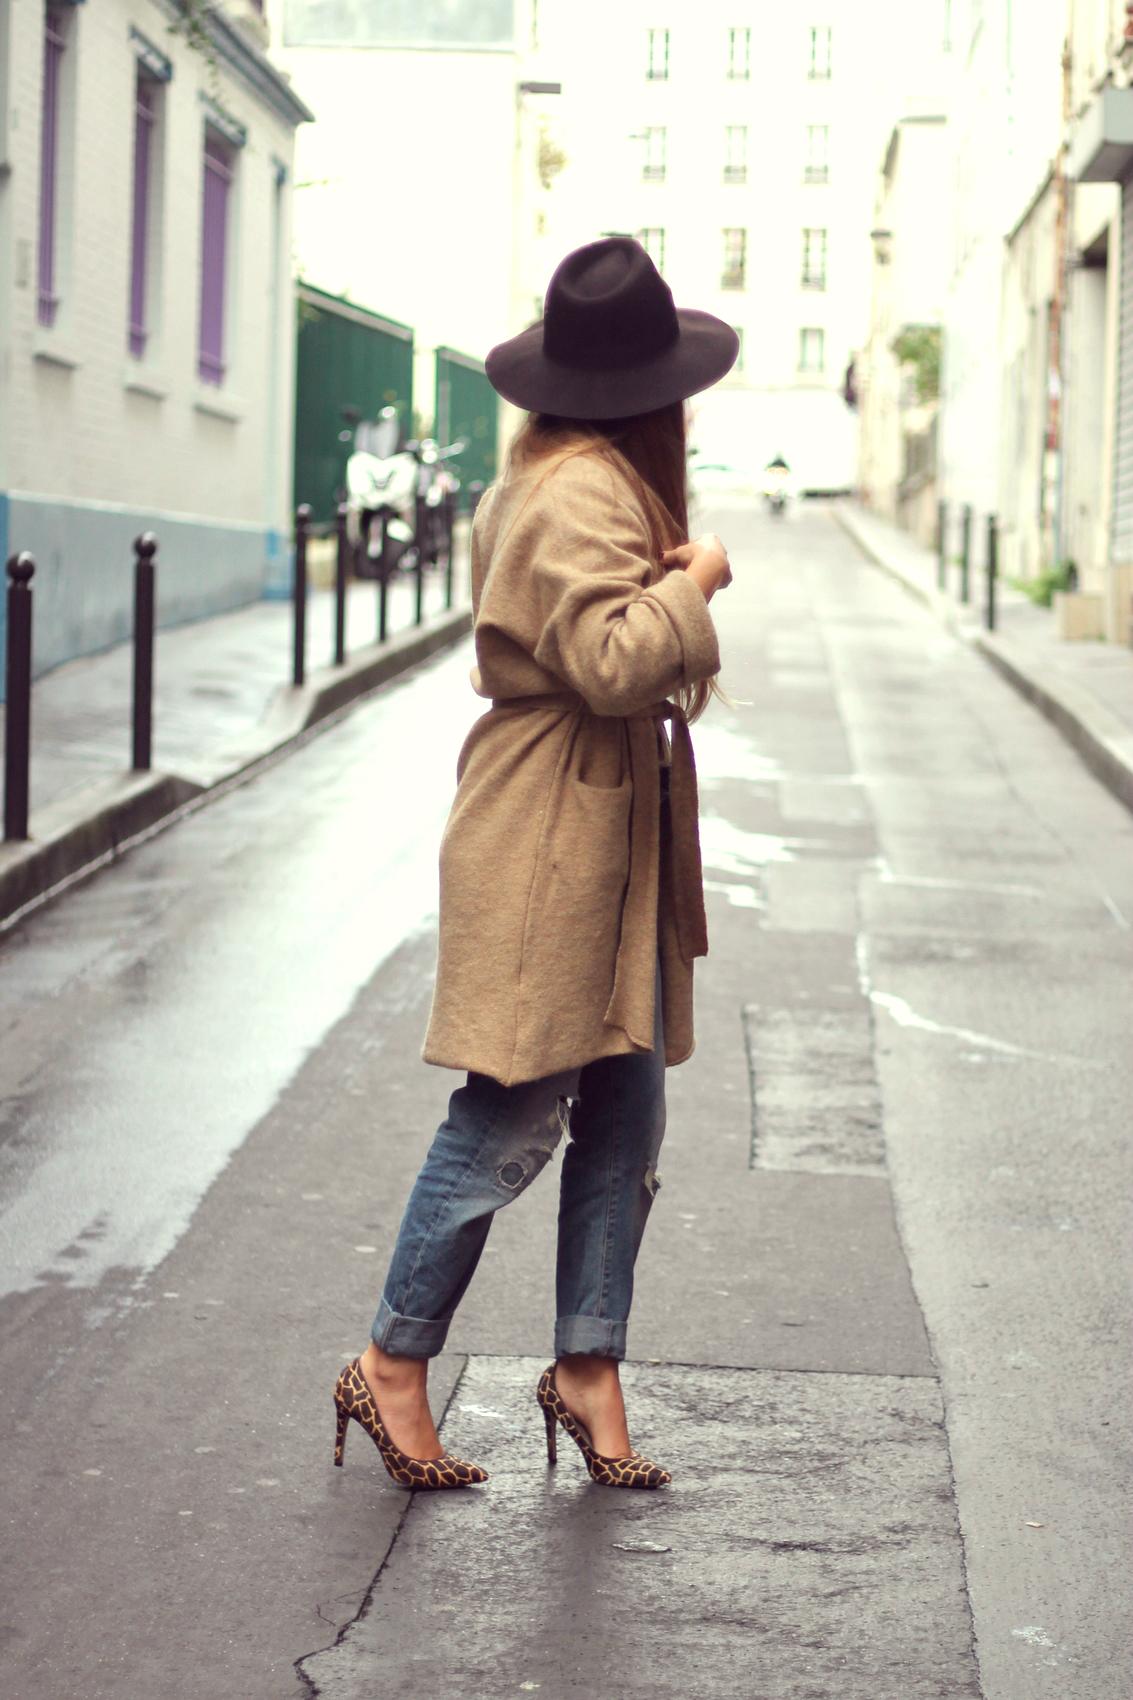 jean boyfriend zara cardigan beige chapeau capeline fedora escarpins talons aiguille